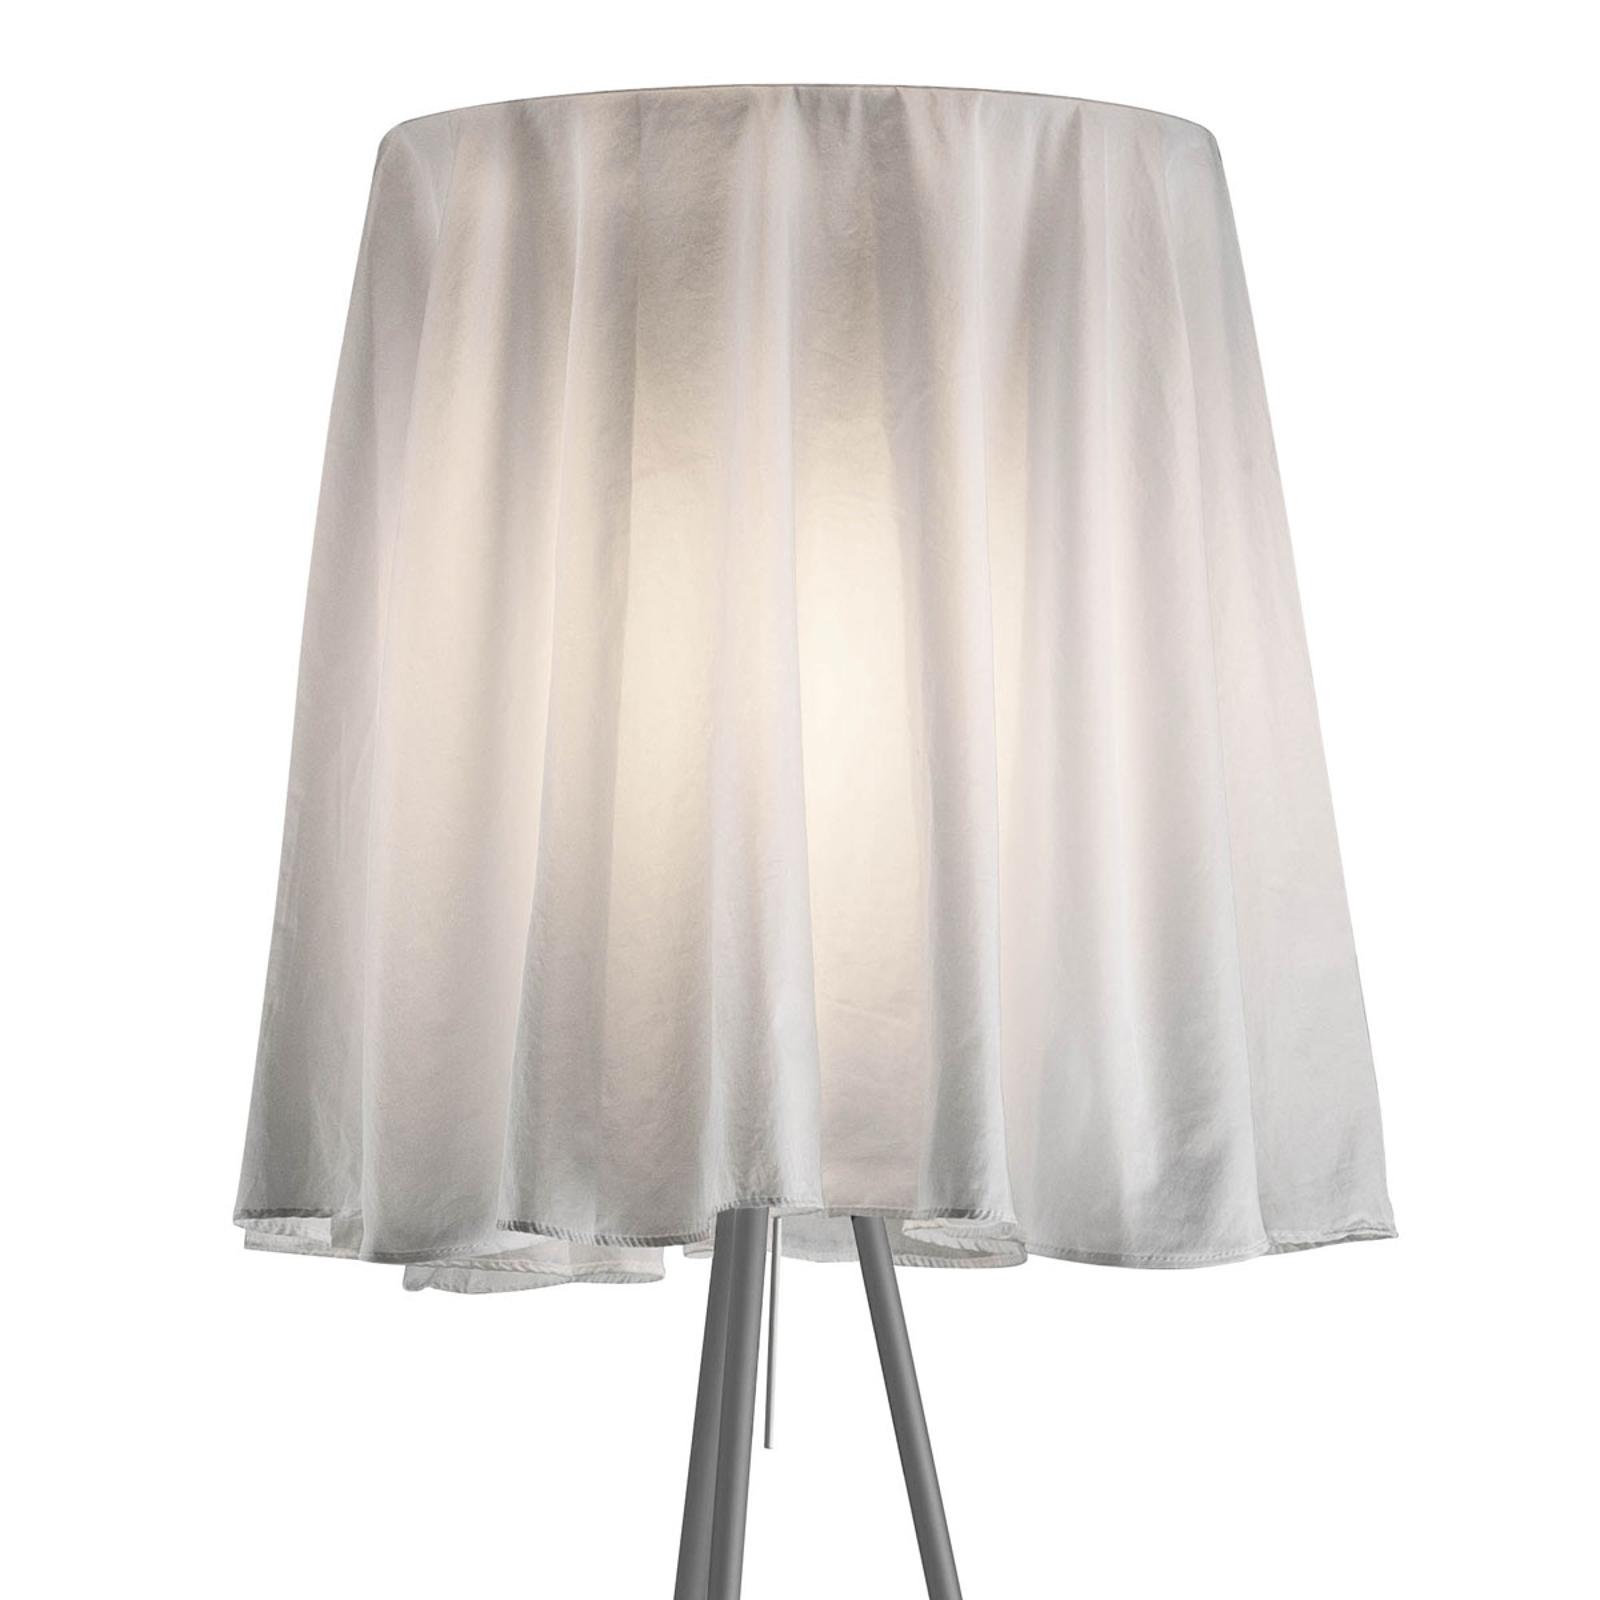 FLOS Rosy Angelis - stojací lampa, stříbrný rám